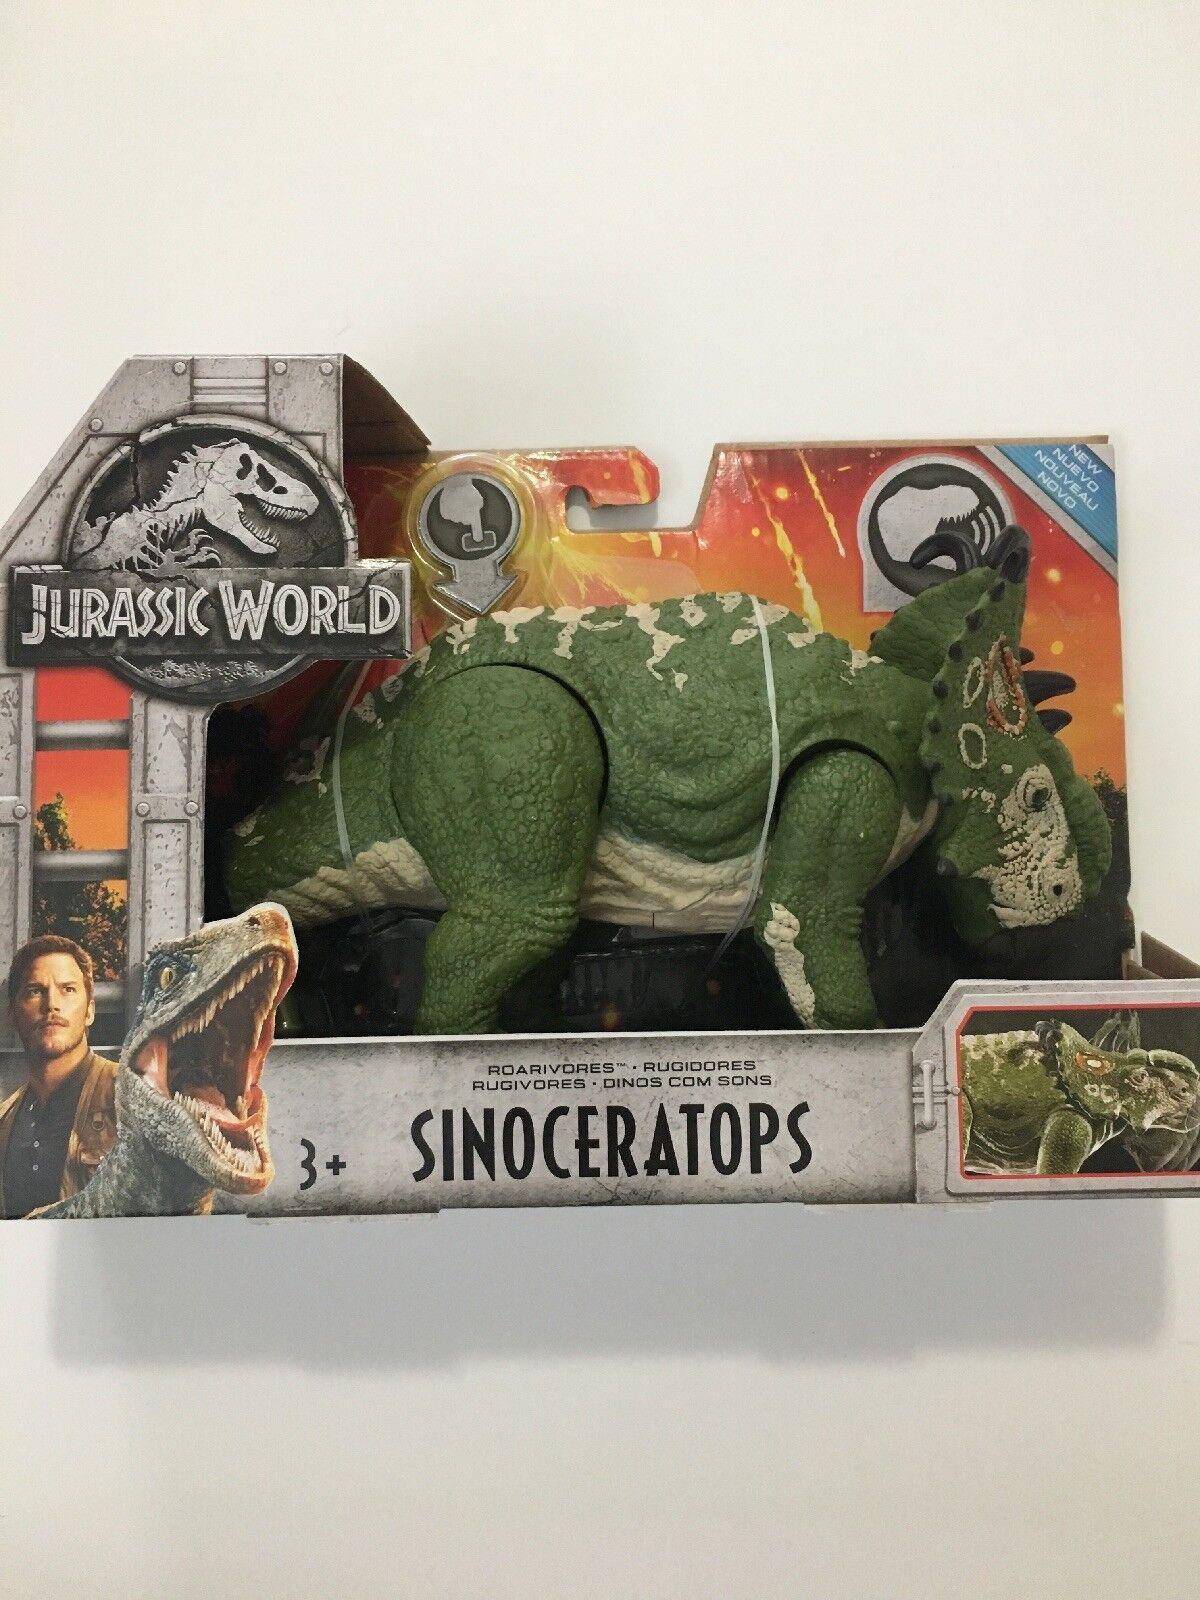 Jurassic World Fallen  Kingdom sinocerahauts Wave 2 roaravores. Jurassic Park  service de première classe